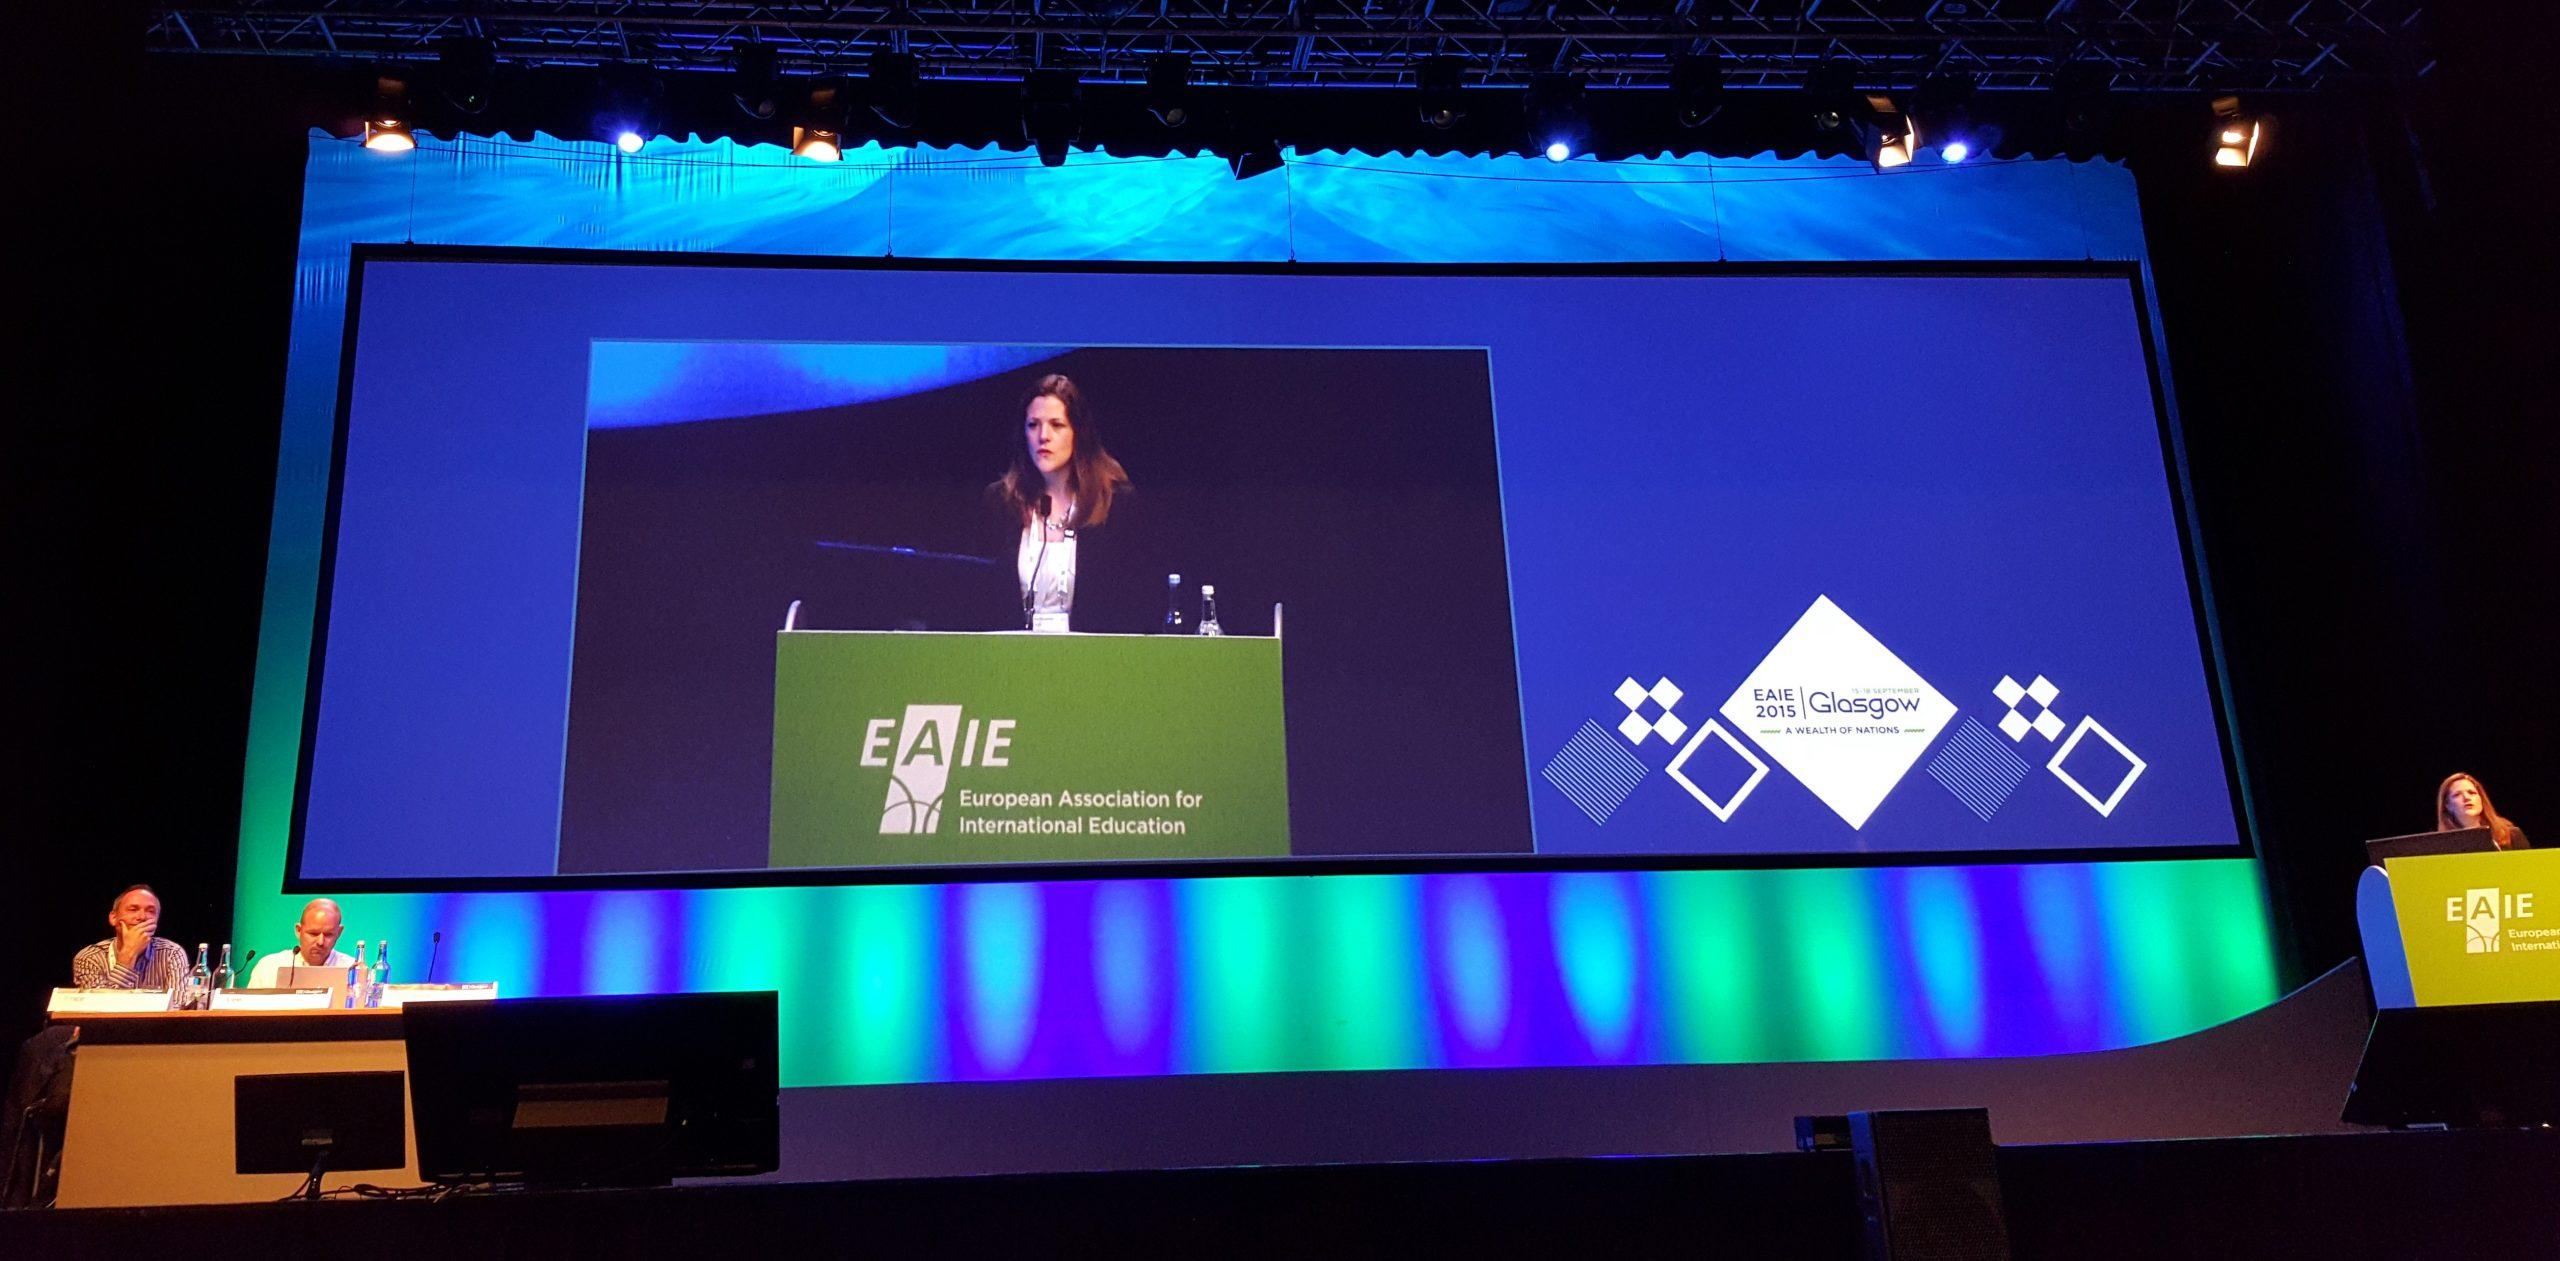 EAIE-2015-content-marketing-speaker-education-seminar